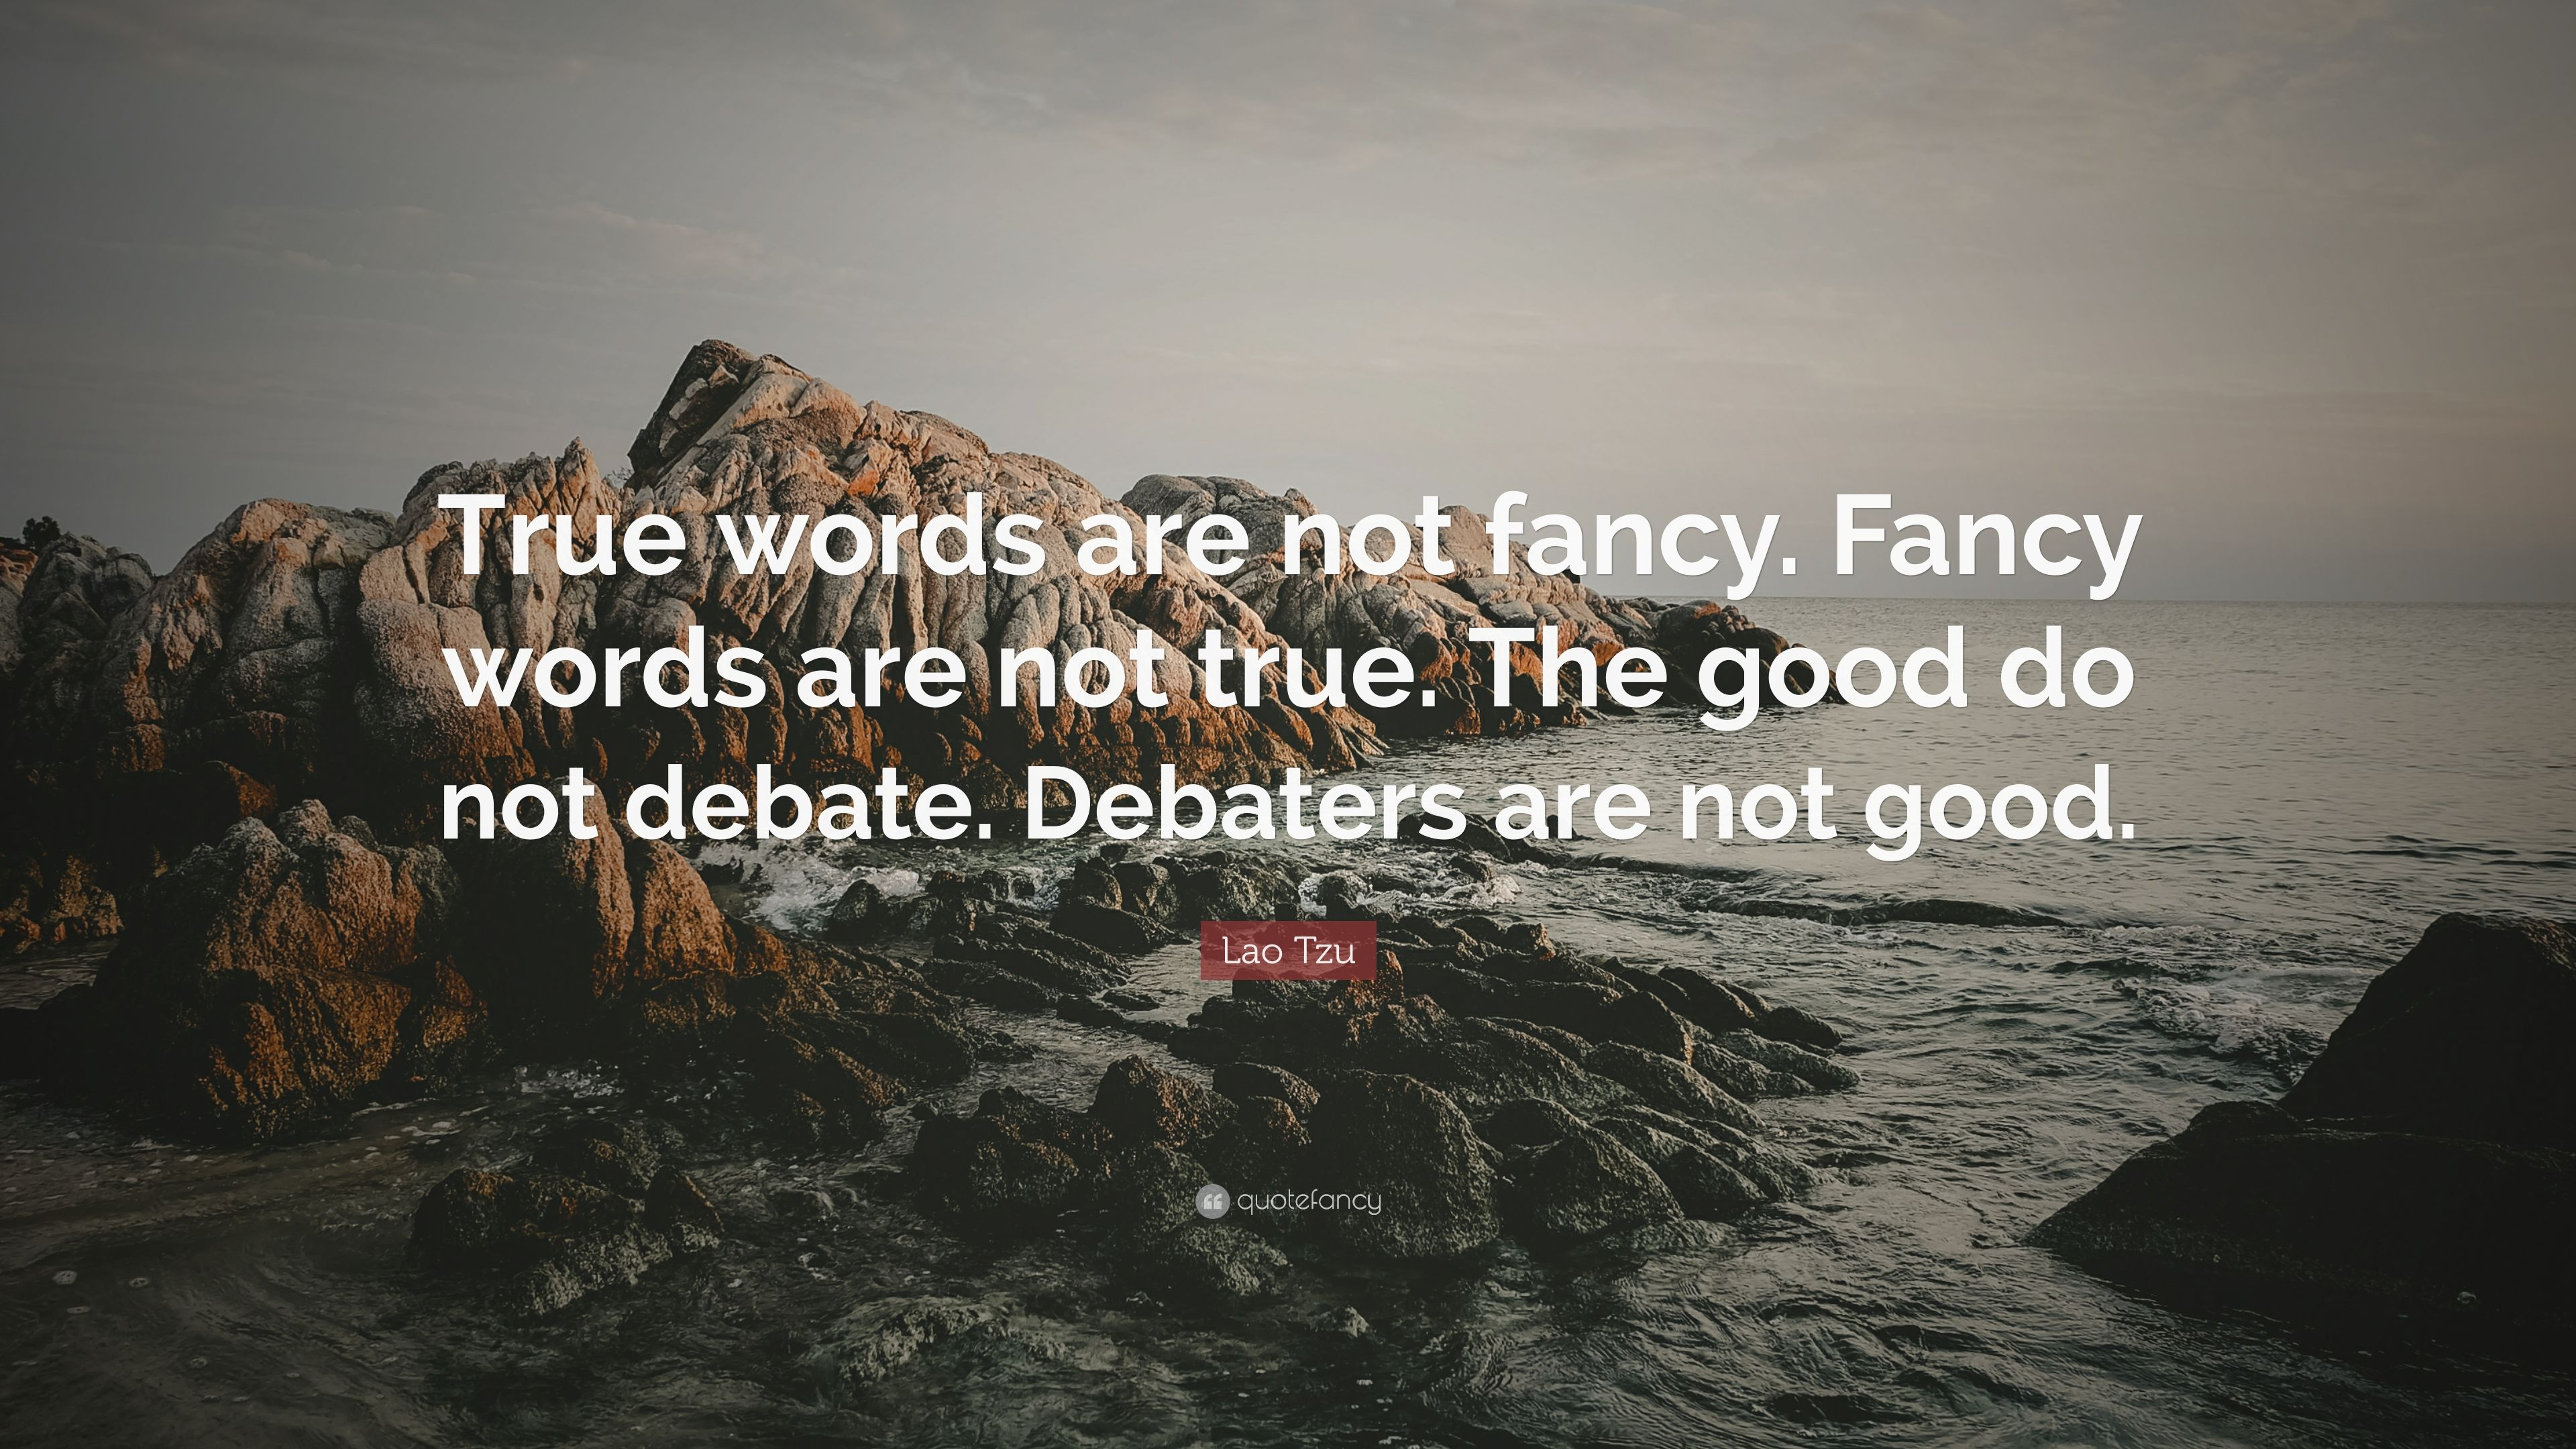 lao tzu quote true words are not fancy fancy words are not true